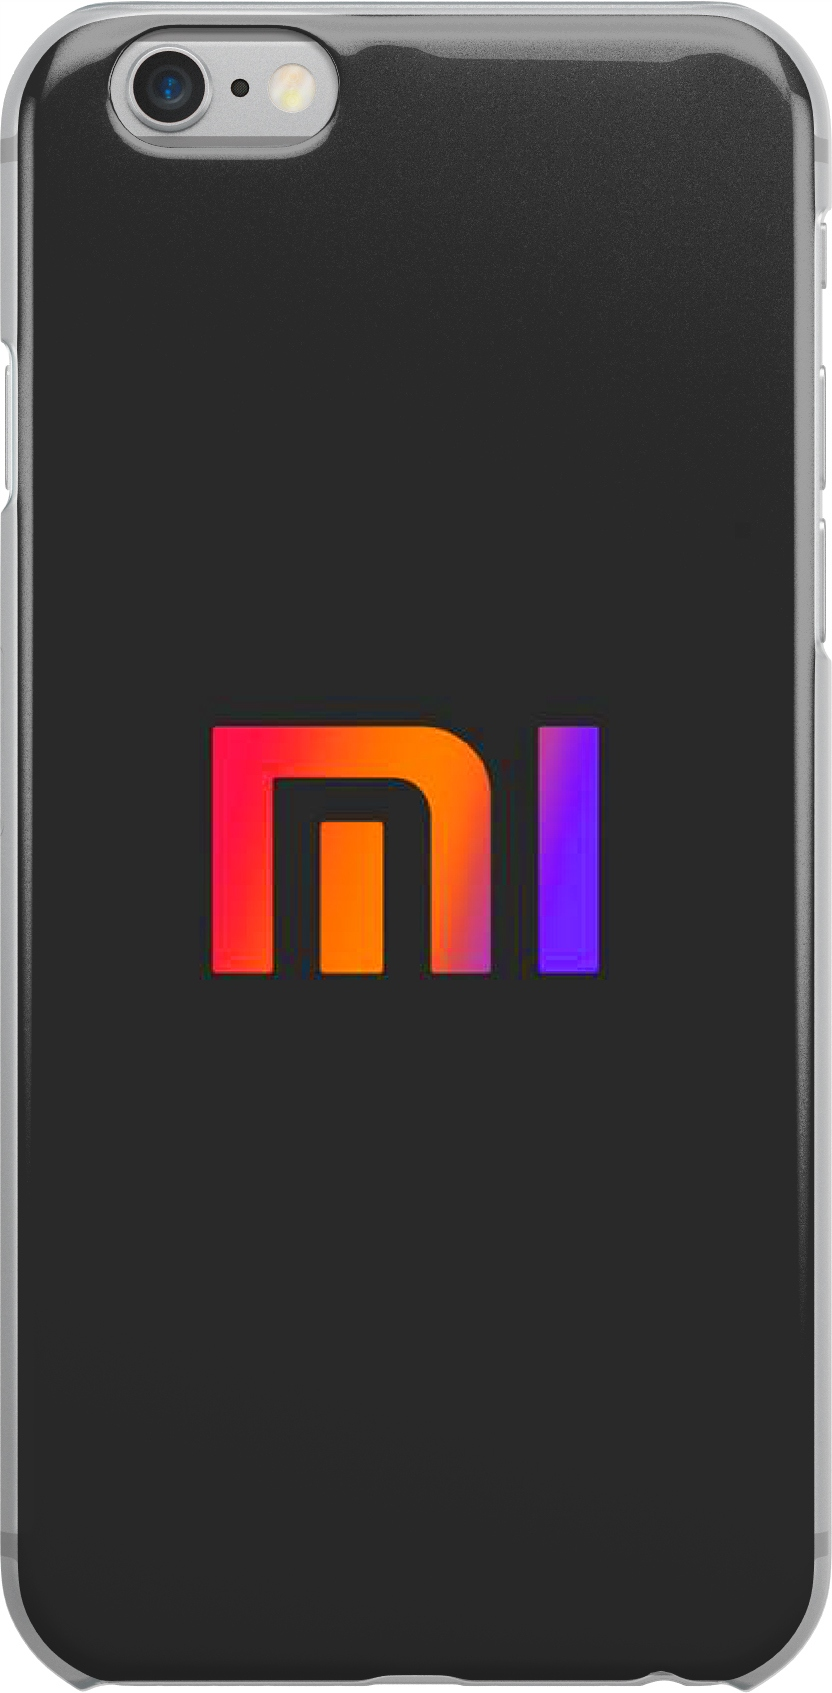 Etui Wzory Xiaomi Nokia 215